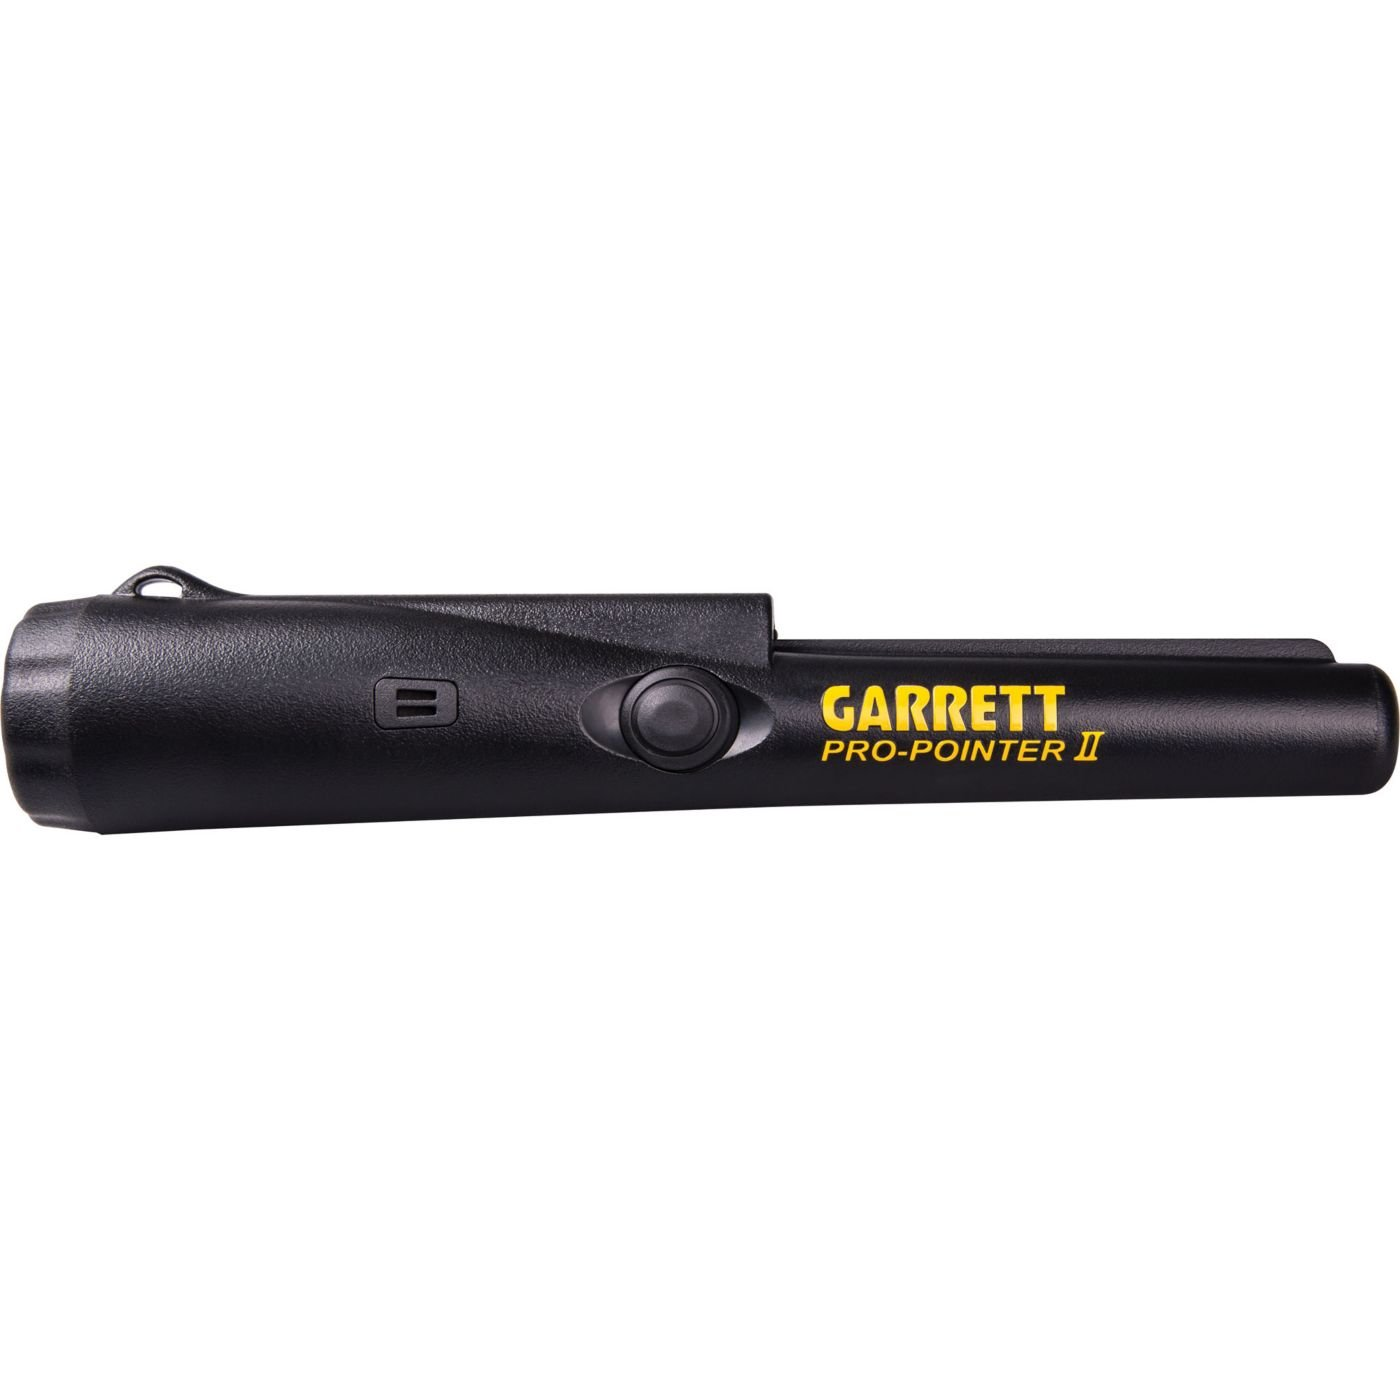 Garette Pro-Pointer II, 1166050